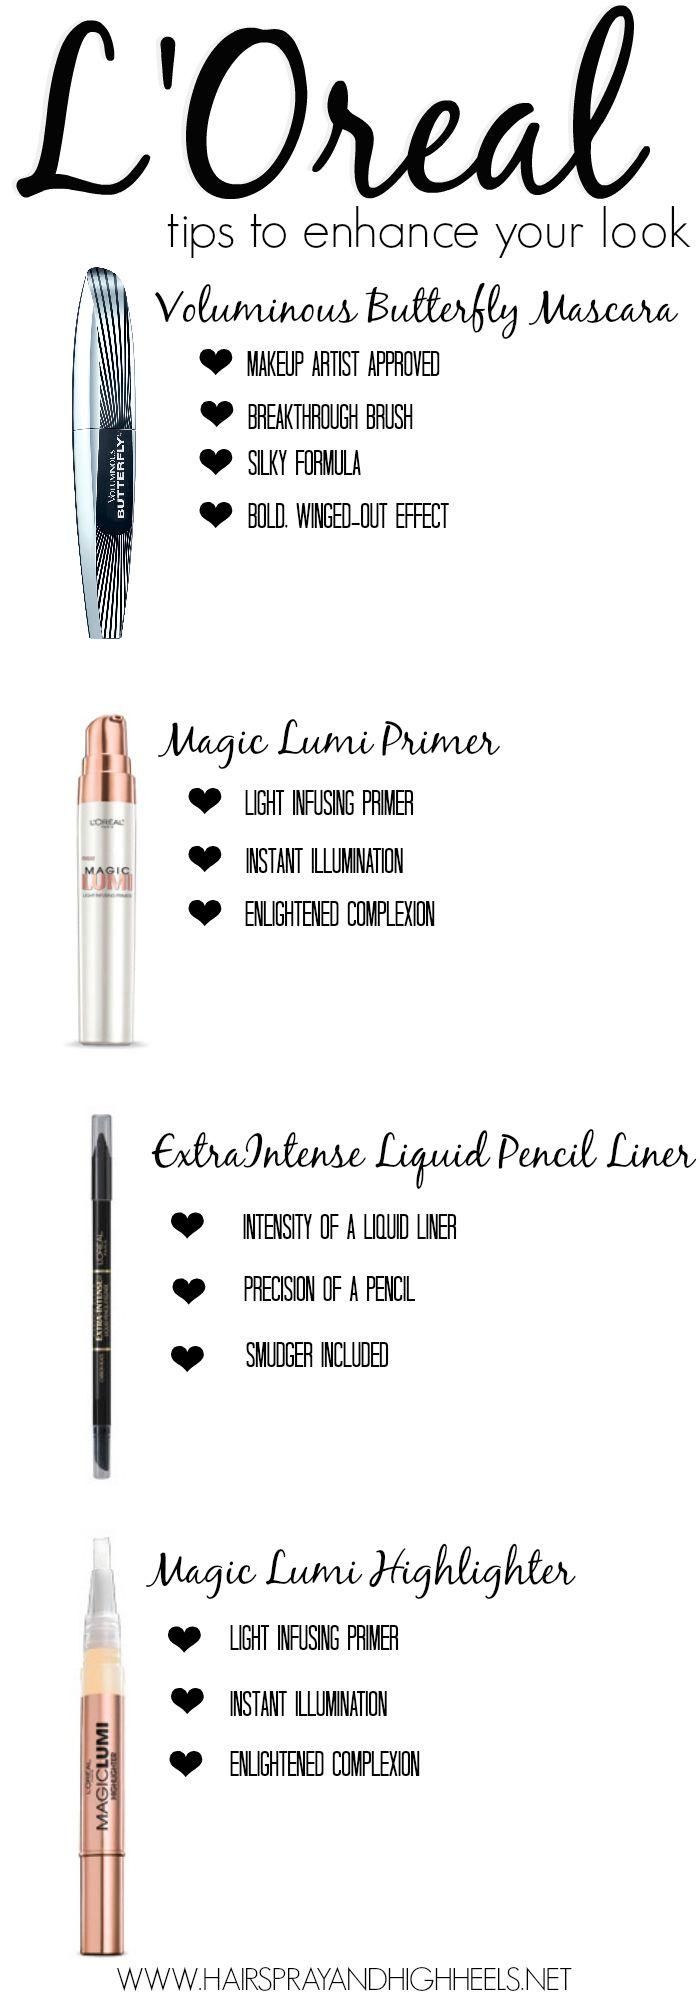 Makeup Tips To Enhance Your Look  via www.hairsprayandhighheels.com #WalgreensBeauty #cbias #shop